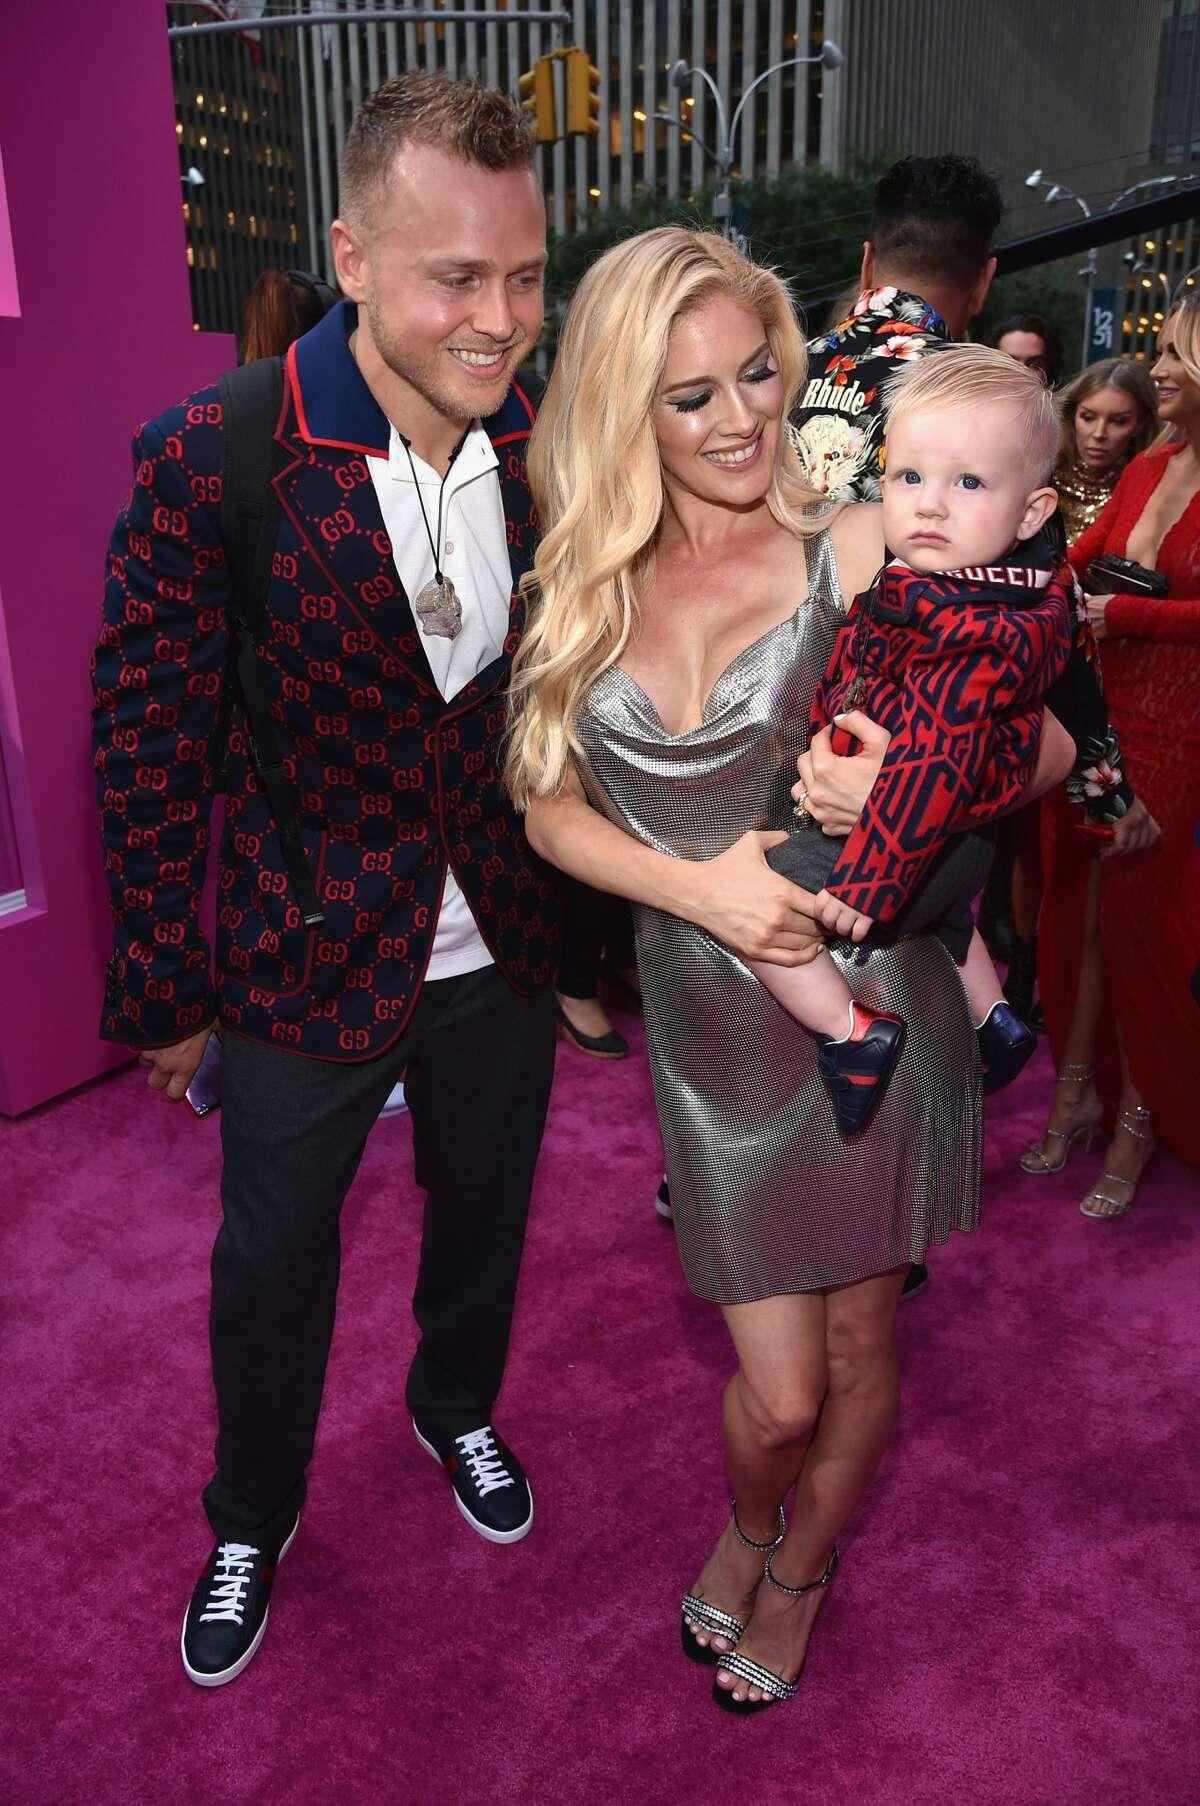 Spencer Pratt, Heidi Pratt and son Gunner Pratt attend the 2018 MTV Video Music Awards at Radio City Music Hall on August 20, 2018 in New York City.